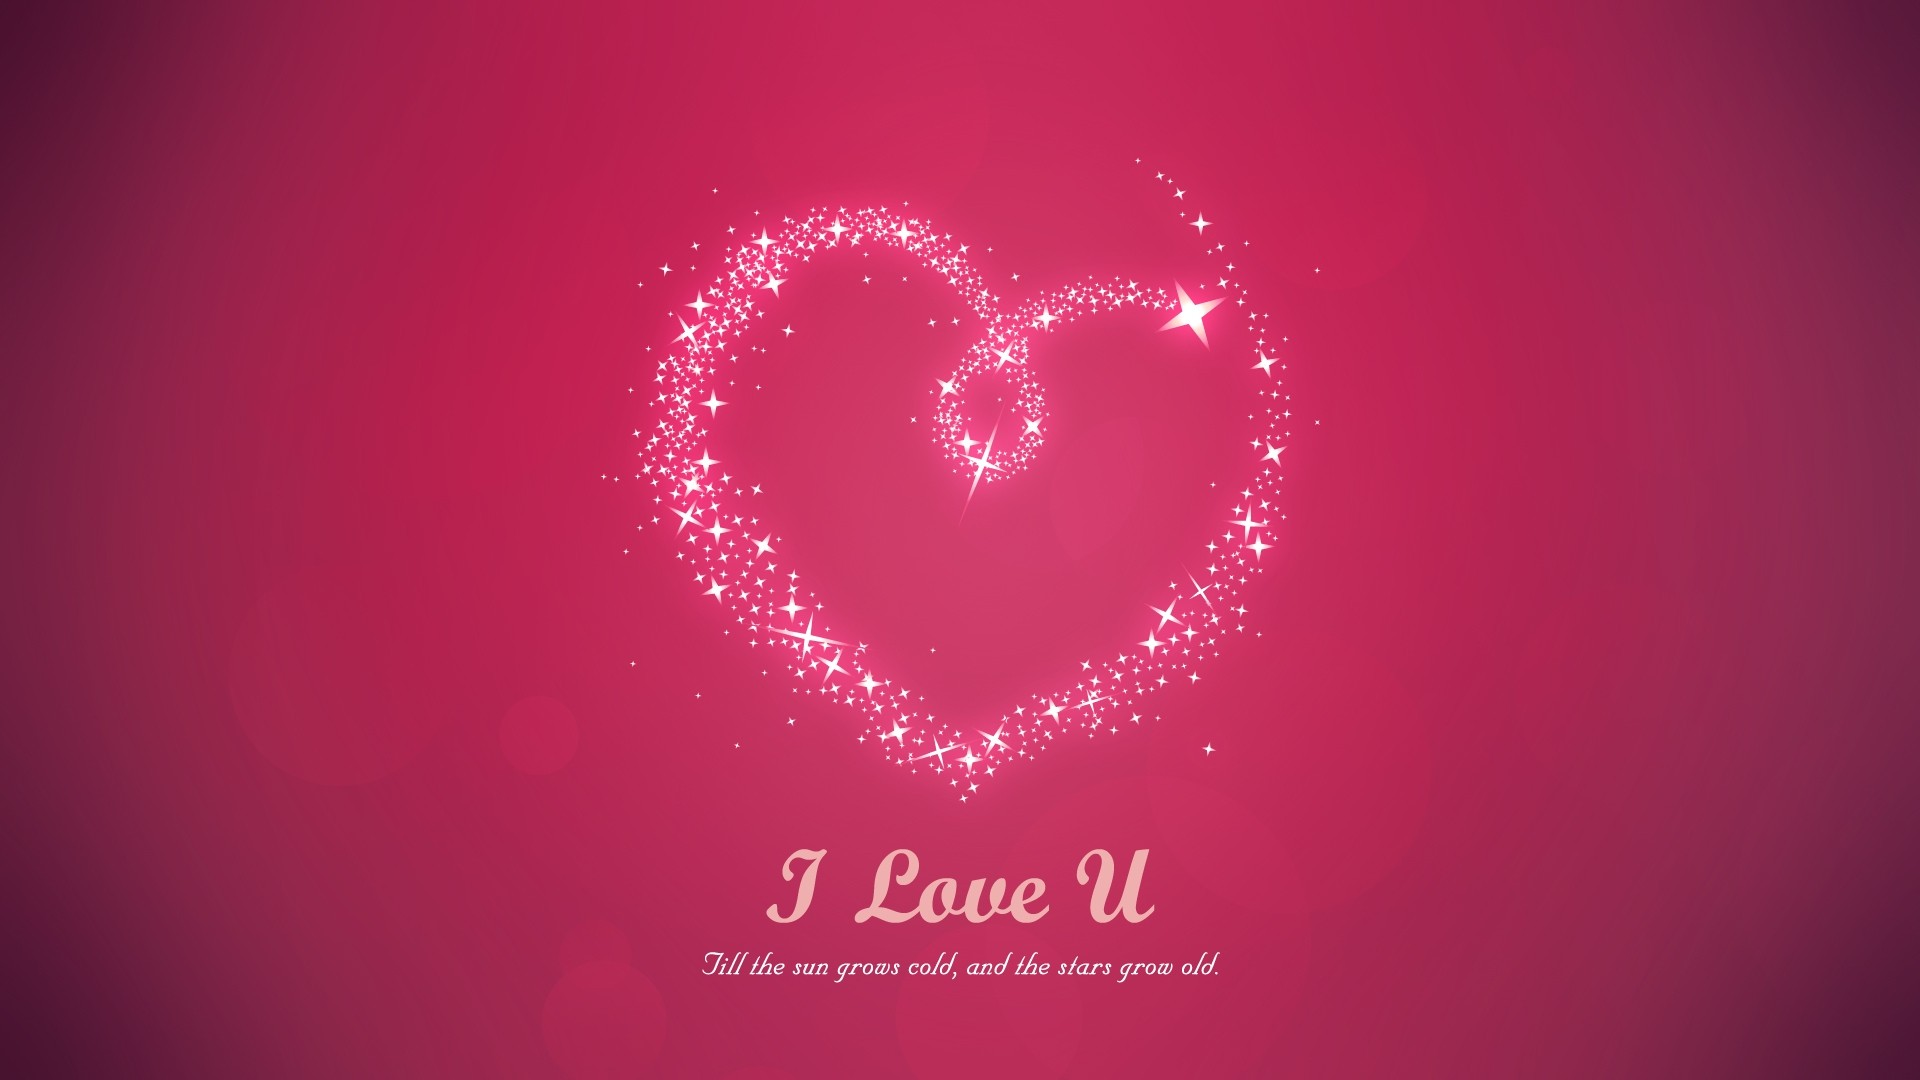 i love you heart wallpaper